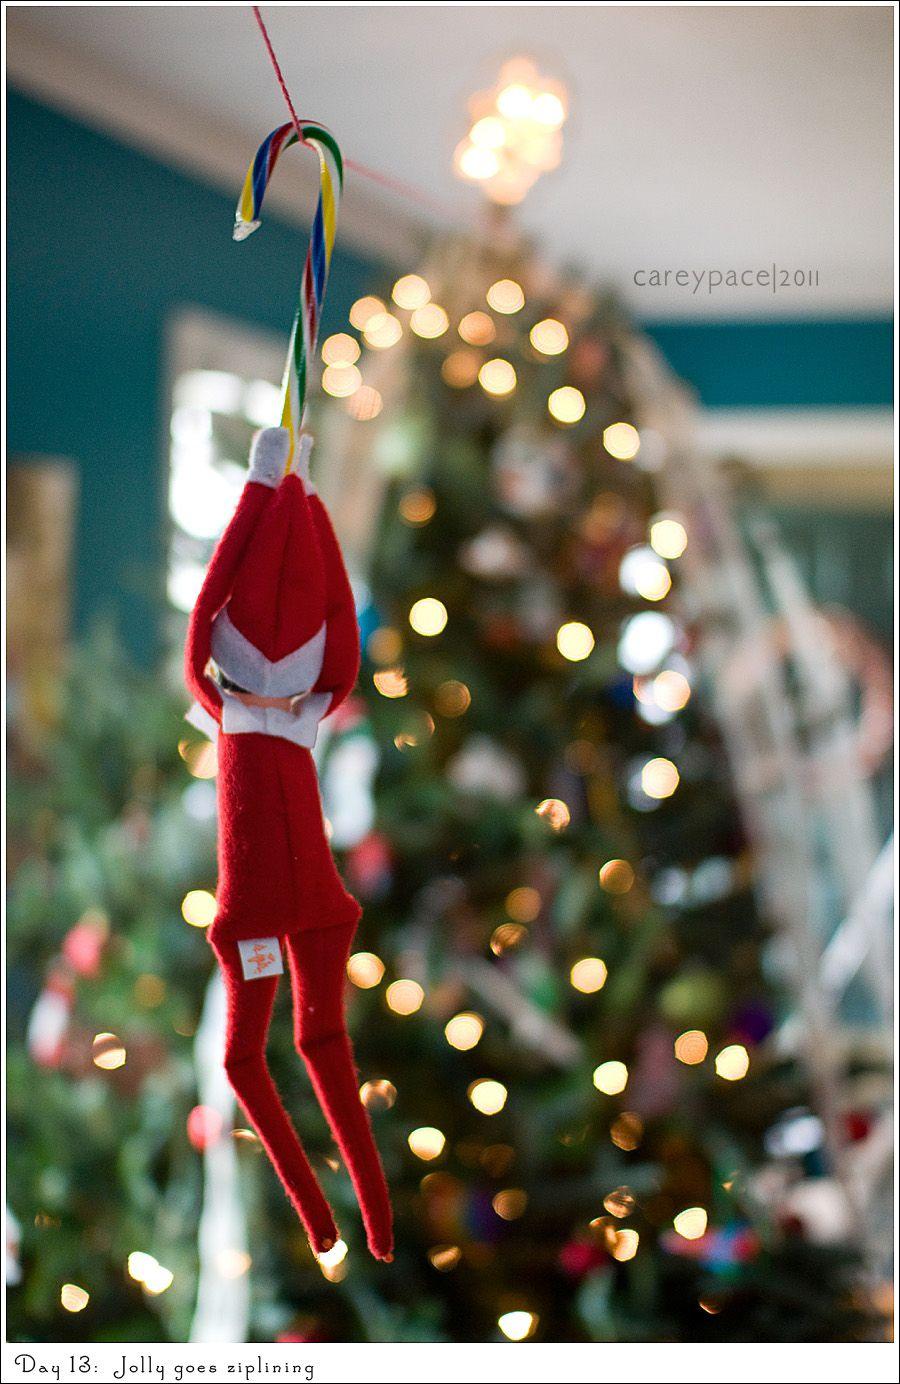 Top 50 elf on the shelf ideas i heart nap time - The Best Elf On The Shelf Ideas On Pinterest